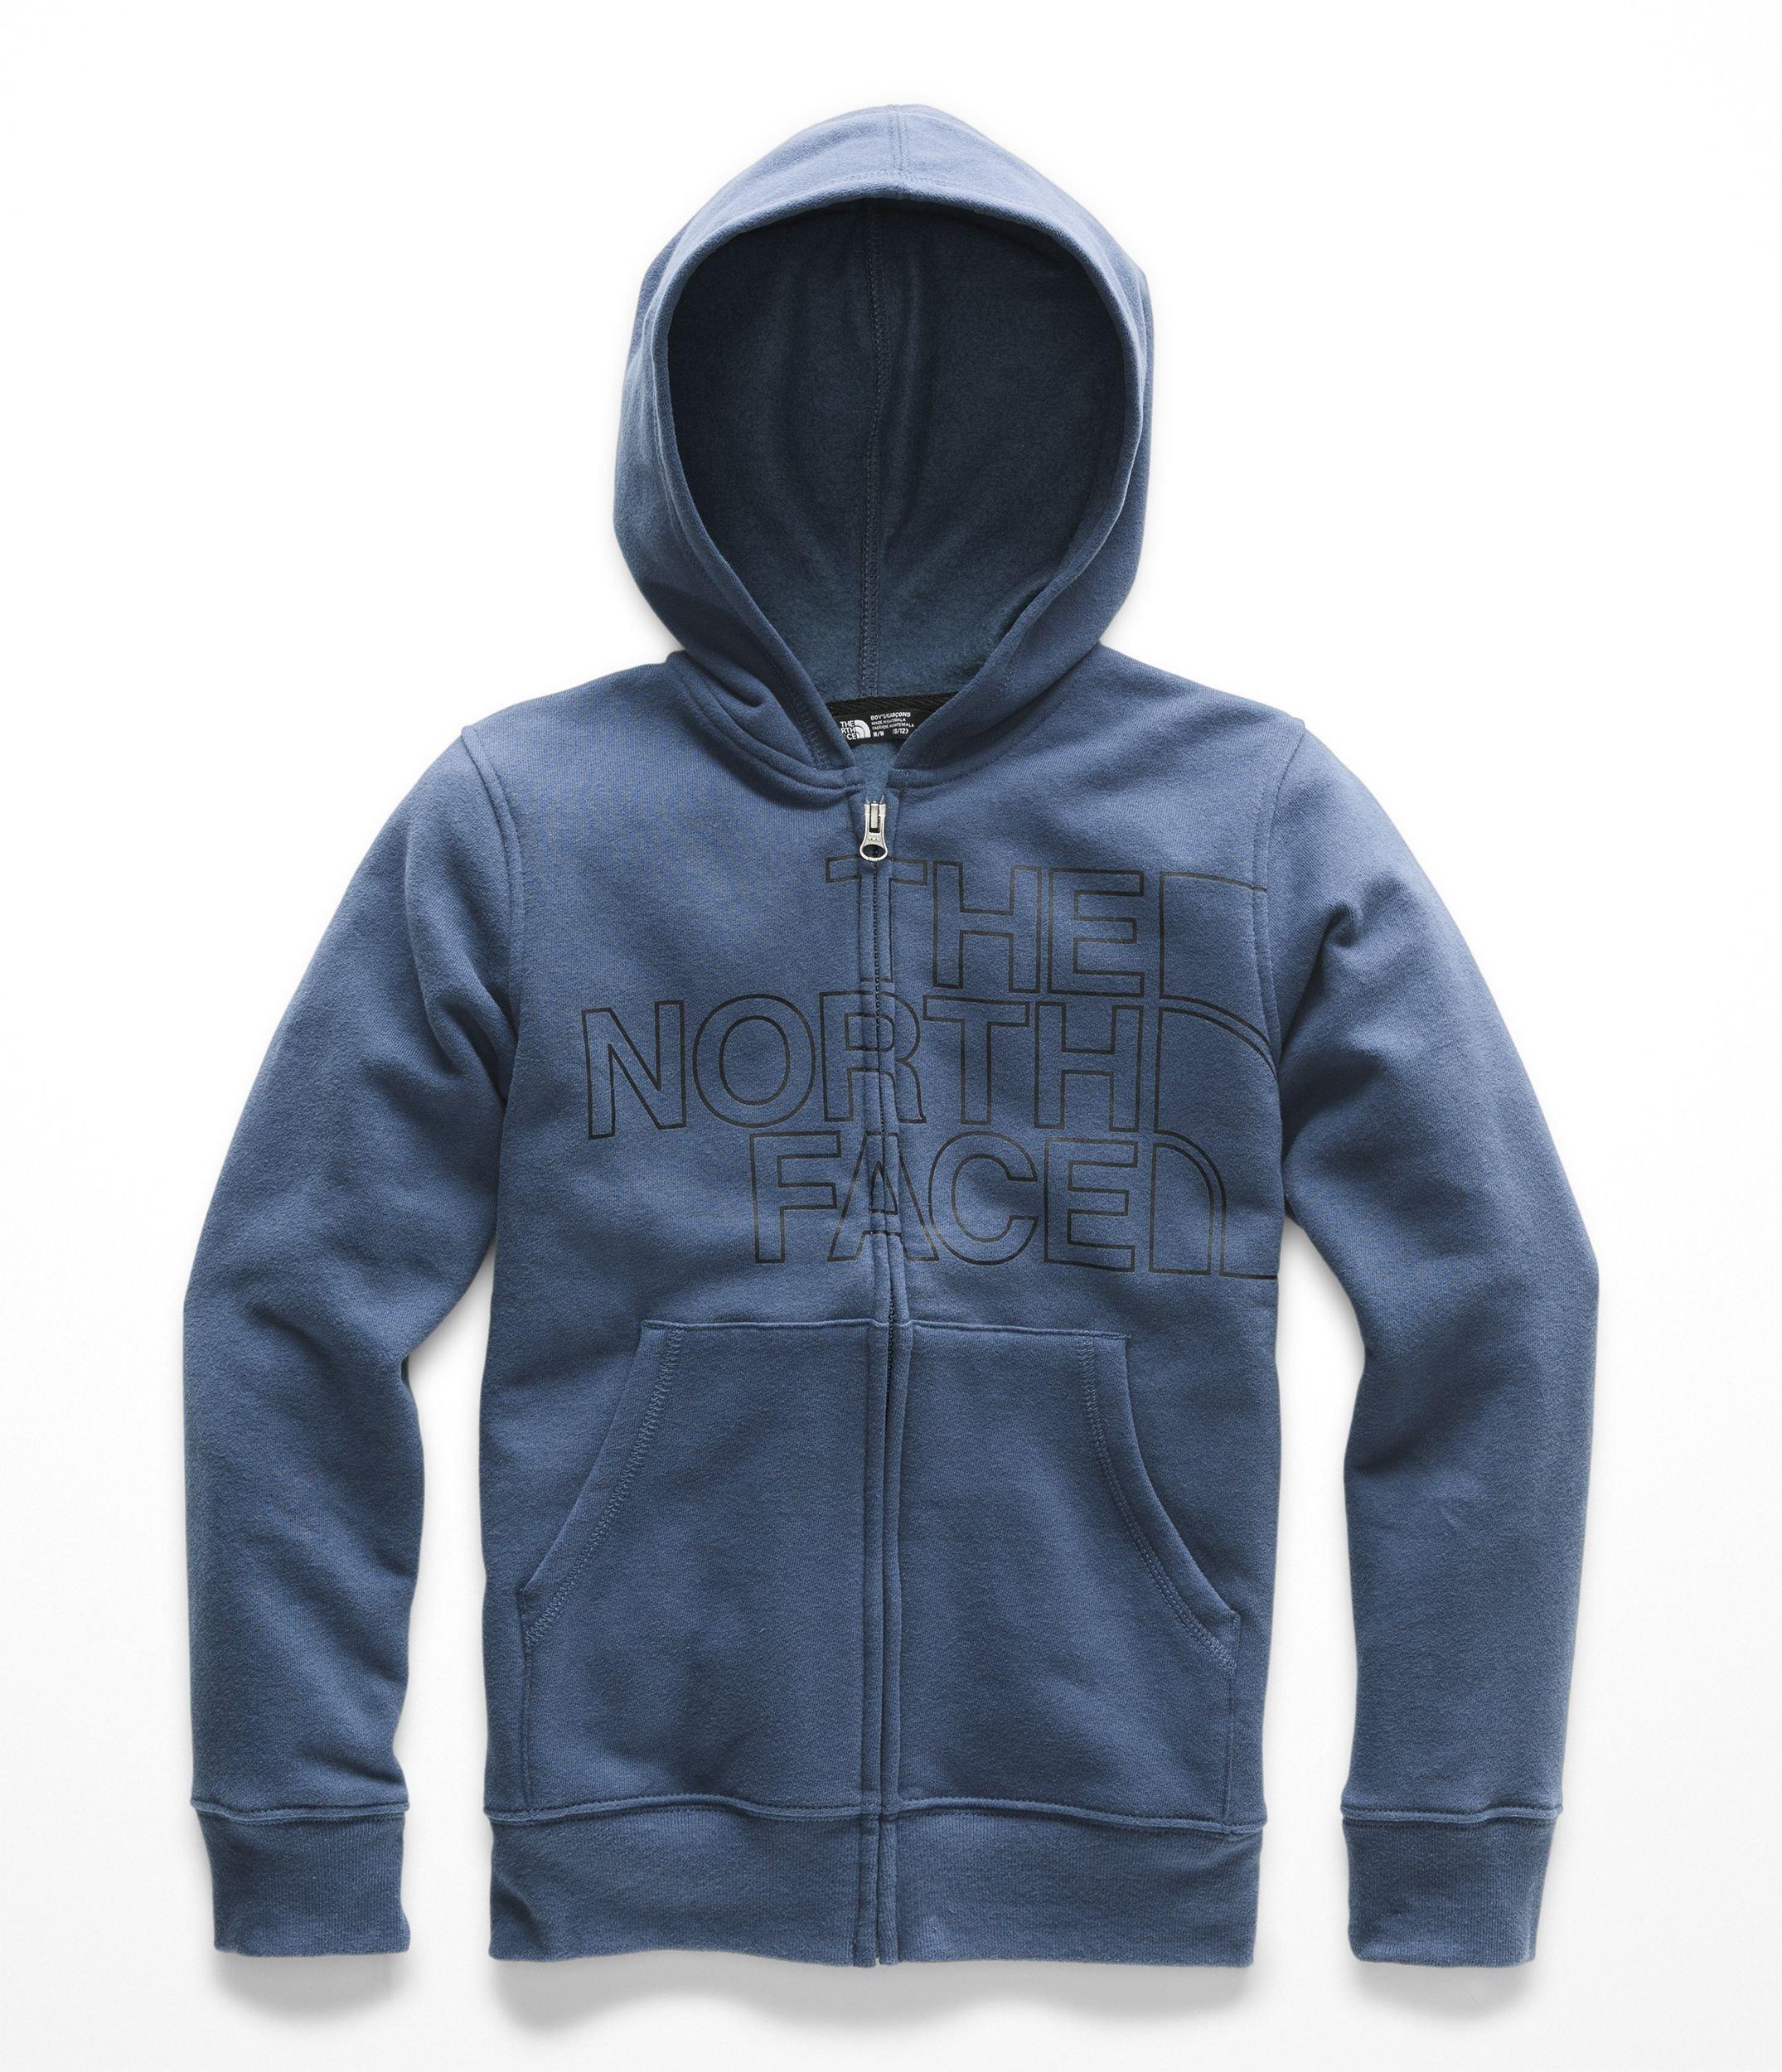 The North Face Boys Logowear Full Zip Hoodie - Shady Blue - L